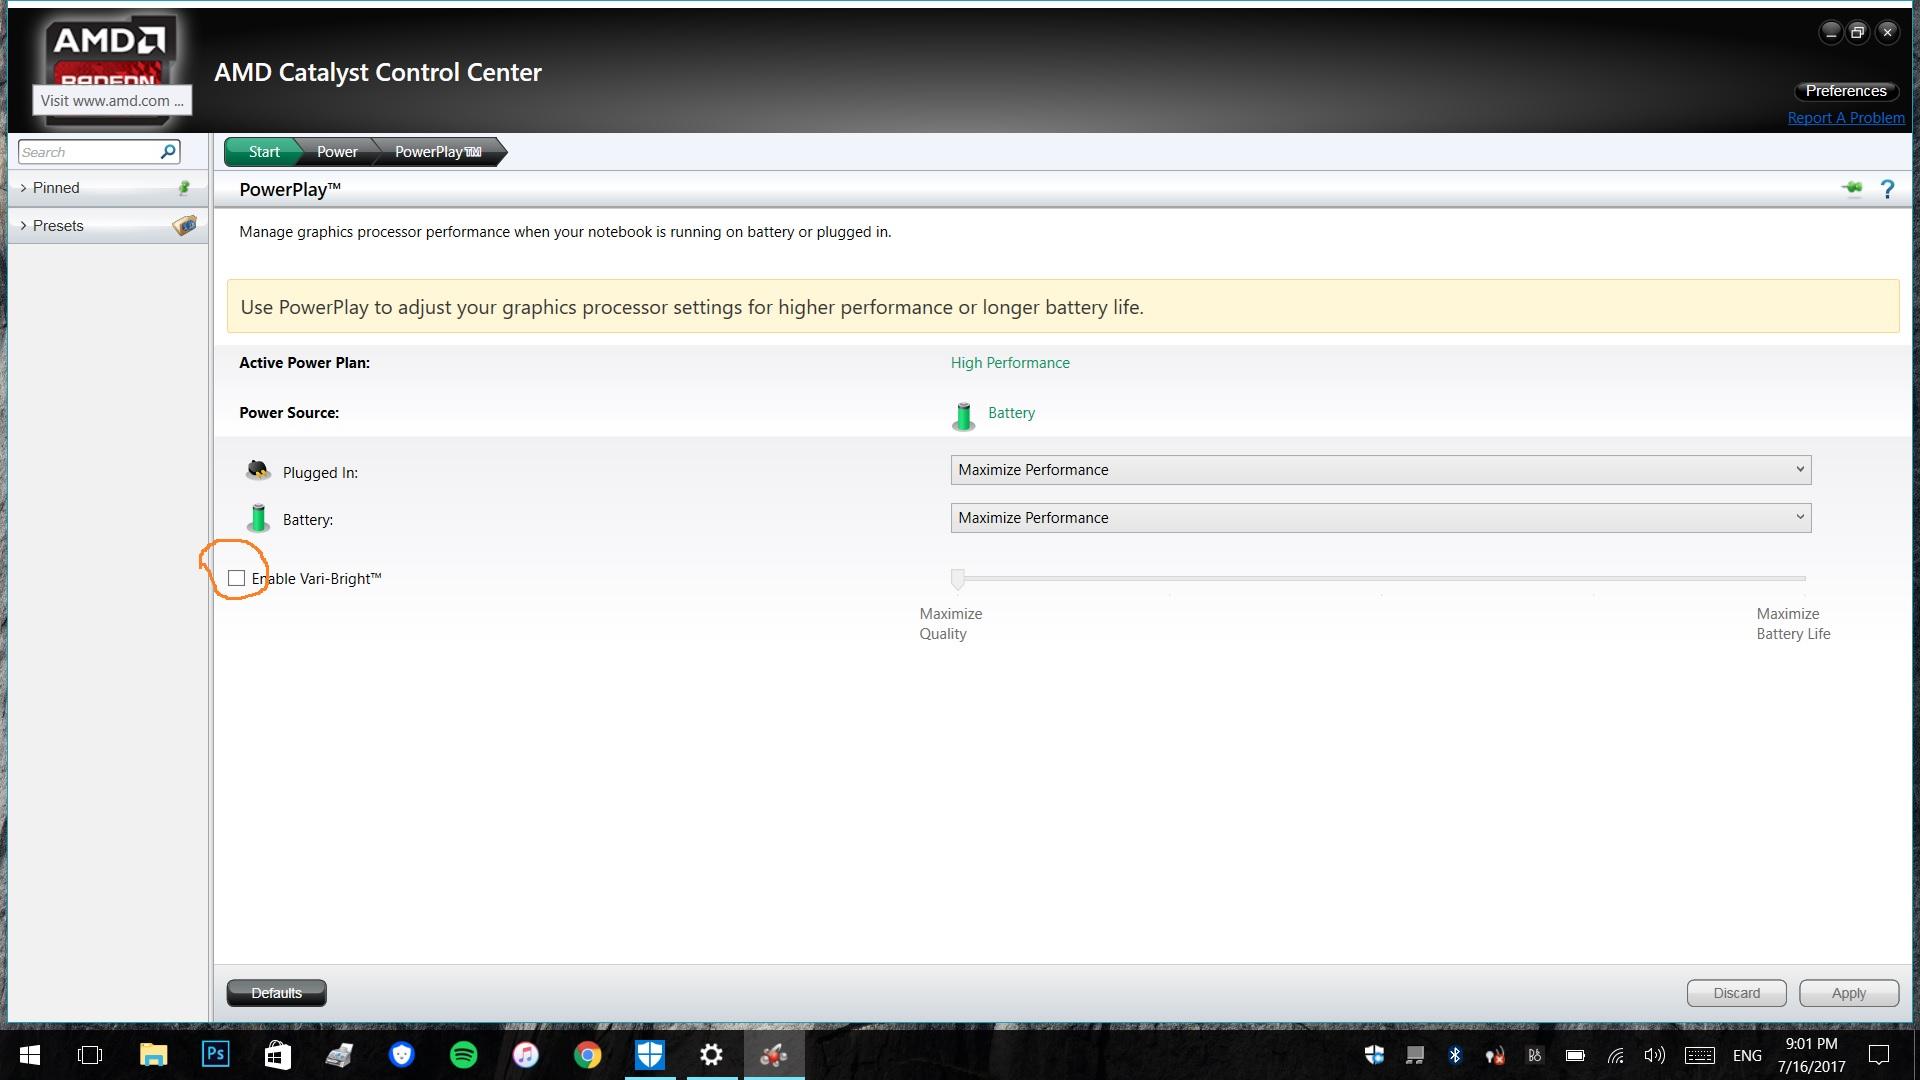 HP Envy M6 Screen Flickering - HP Support Community - 5483879